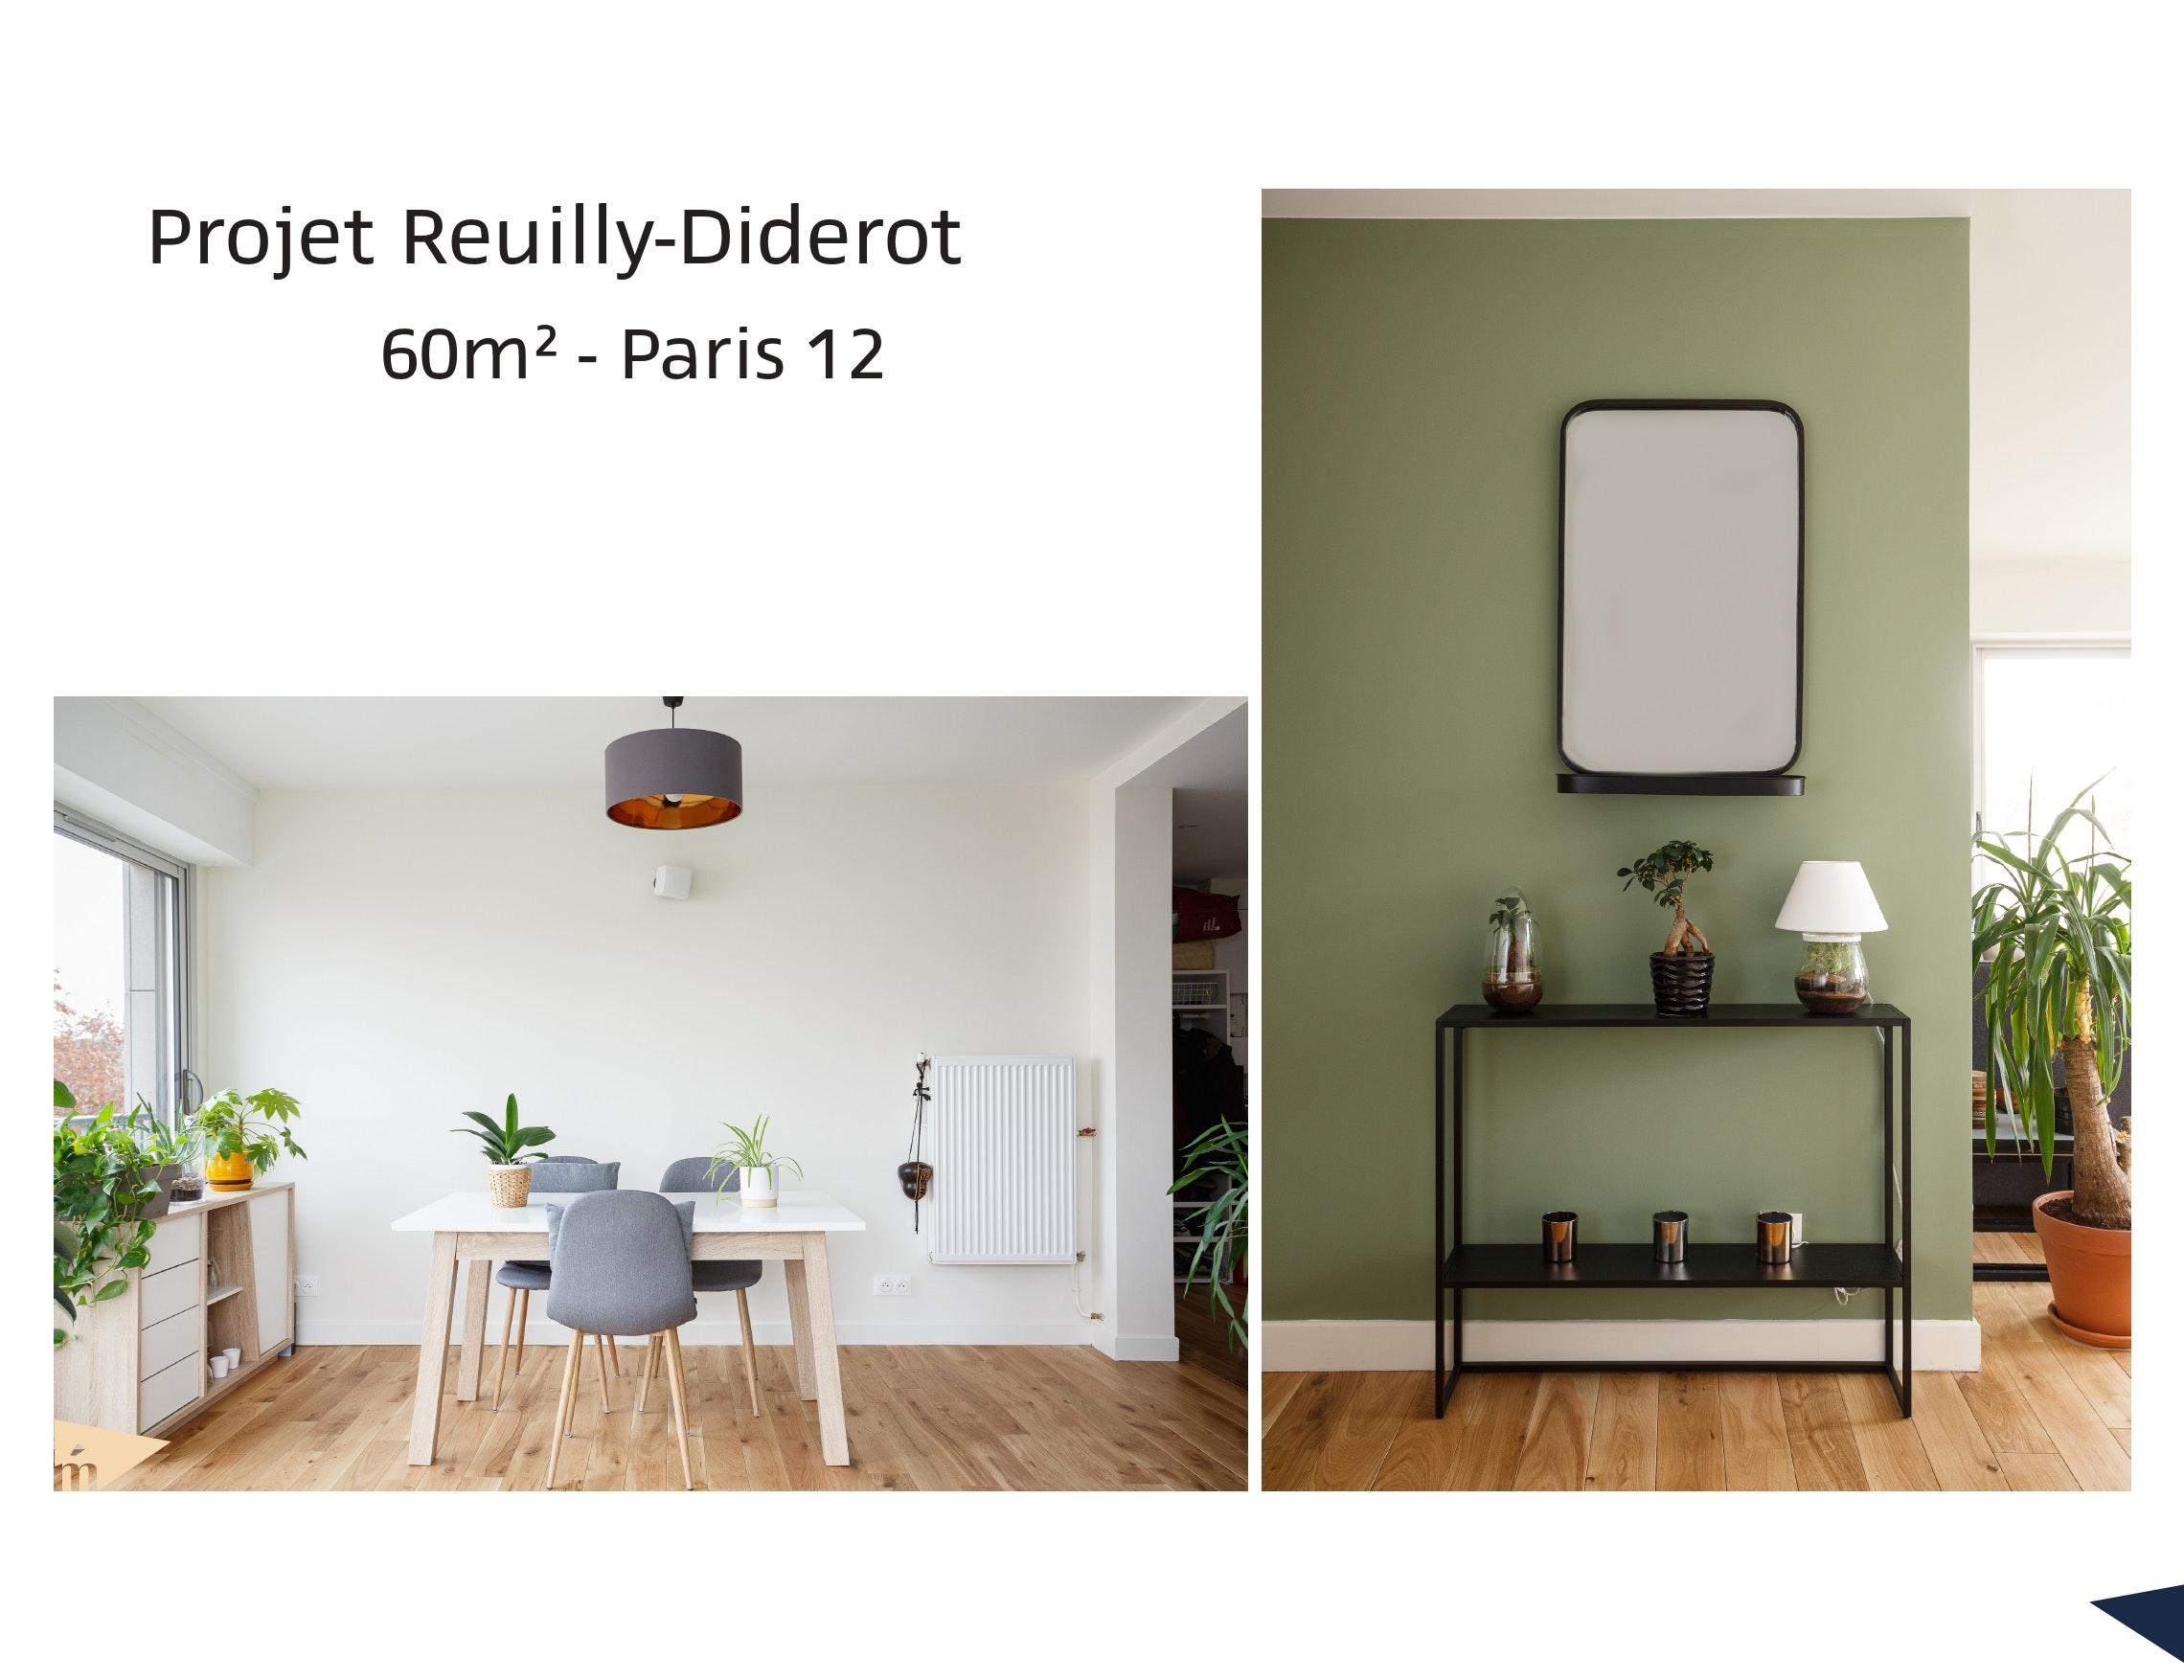 photo Projet Reuilly-Diderot - 60m² - Paris 12 Léa Mast - Architecte hemea